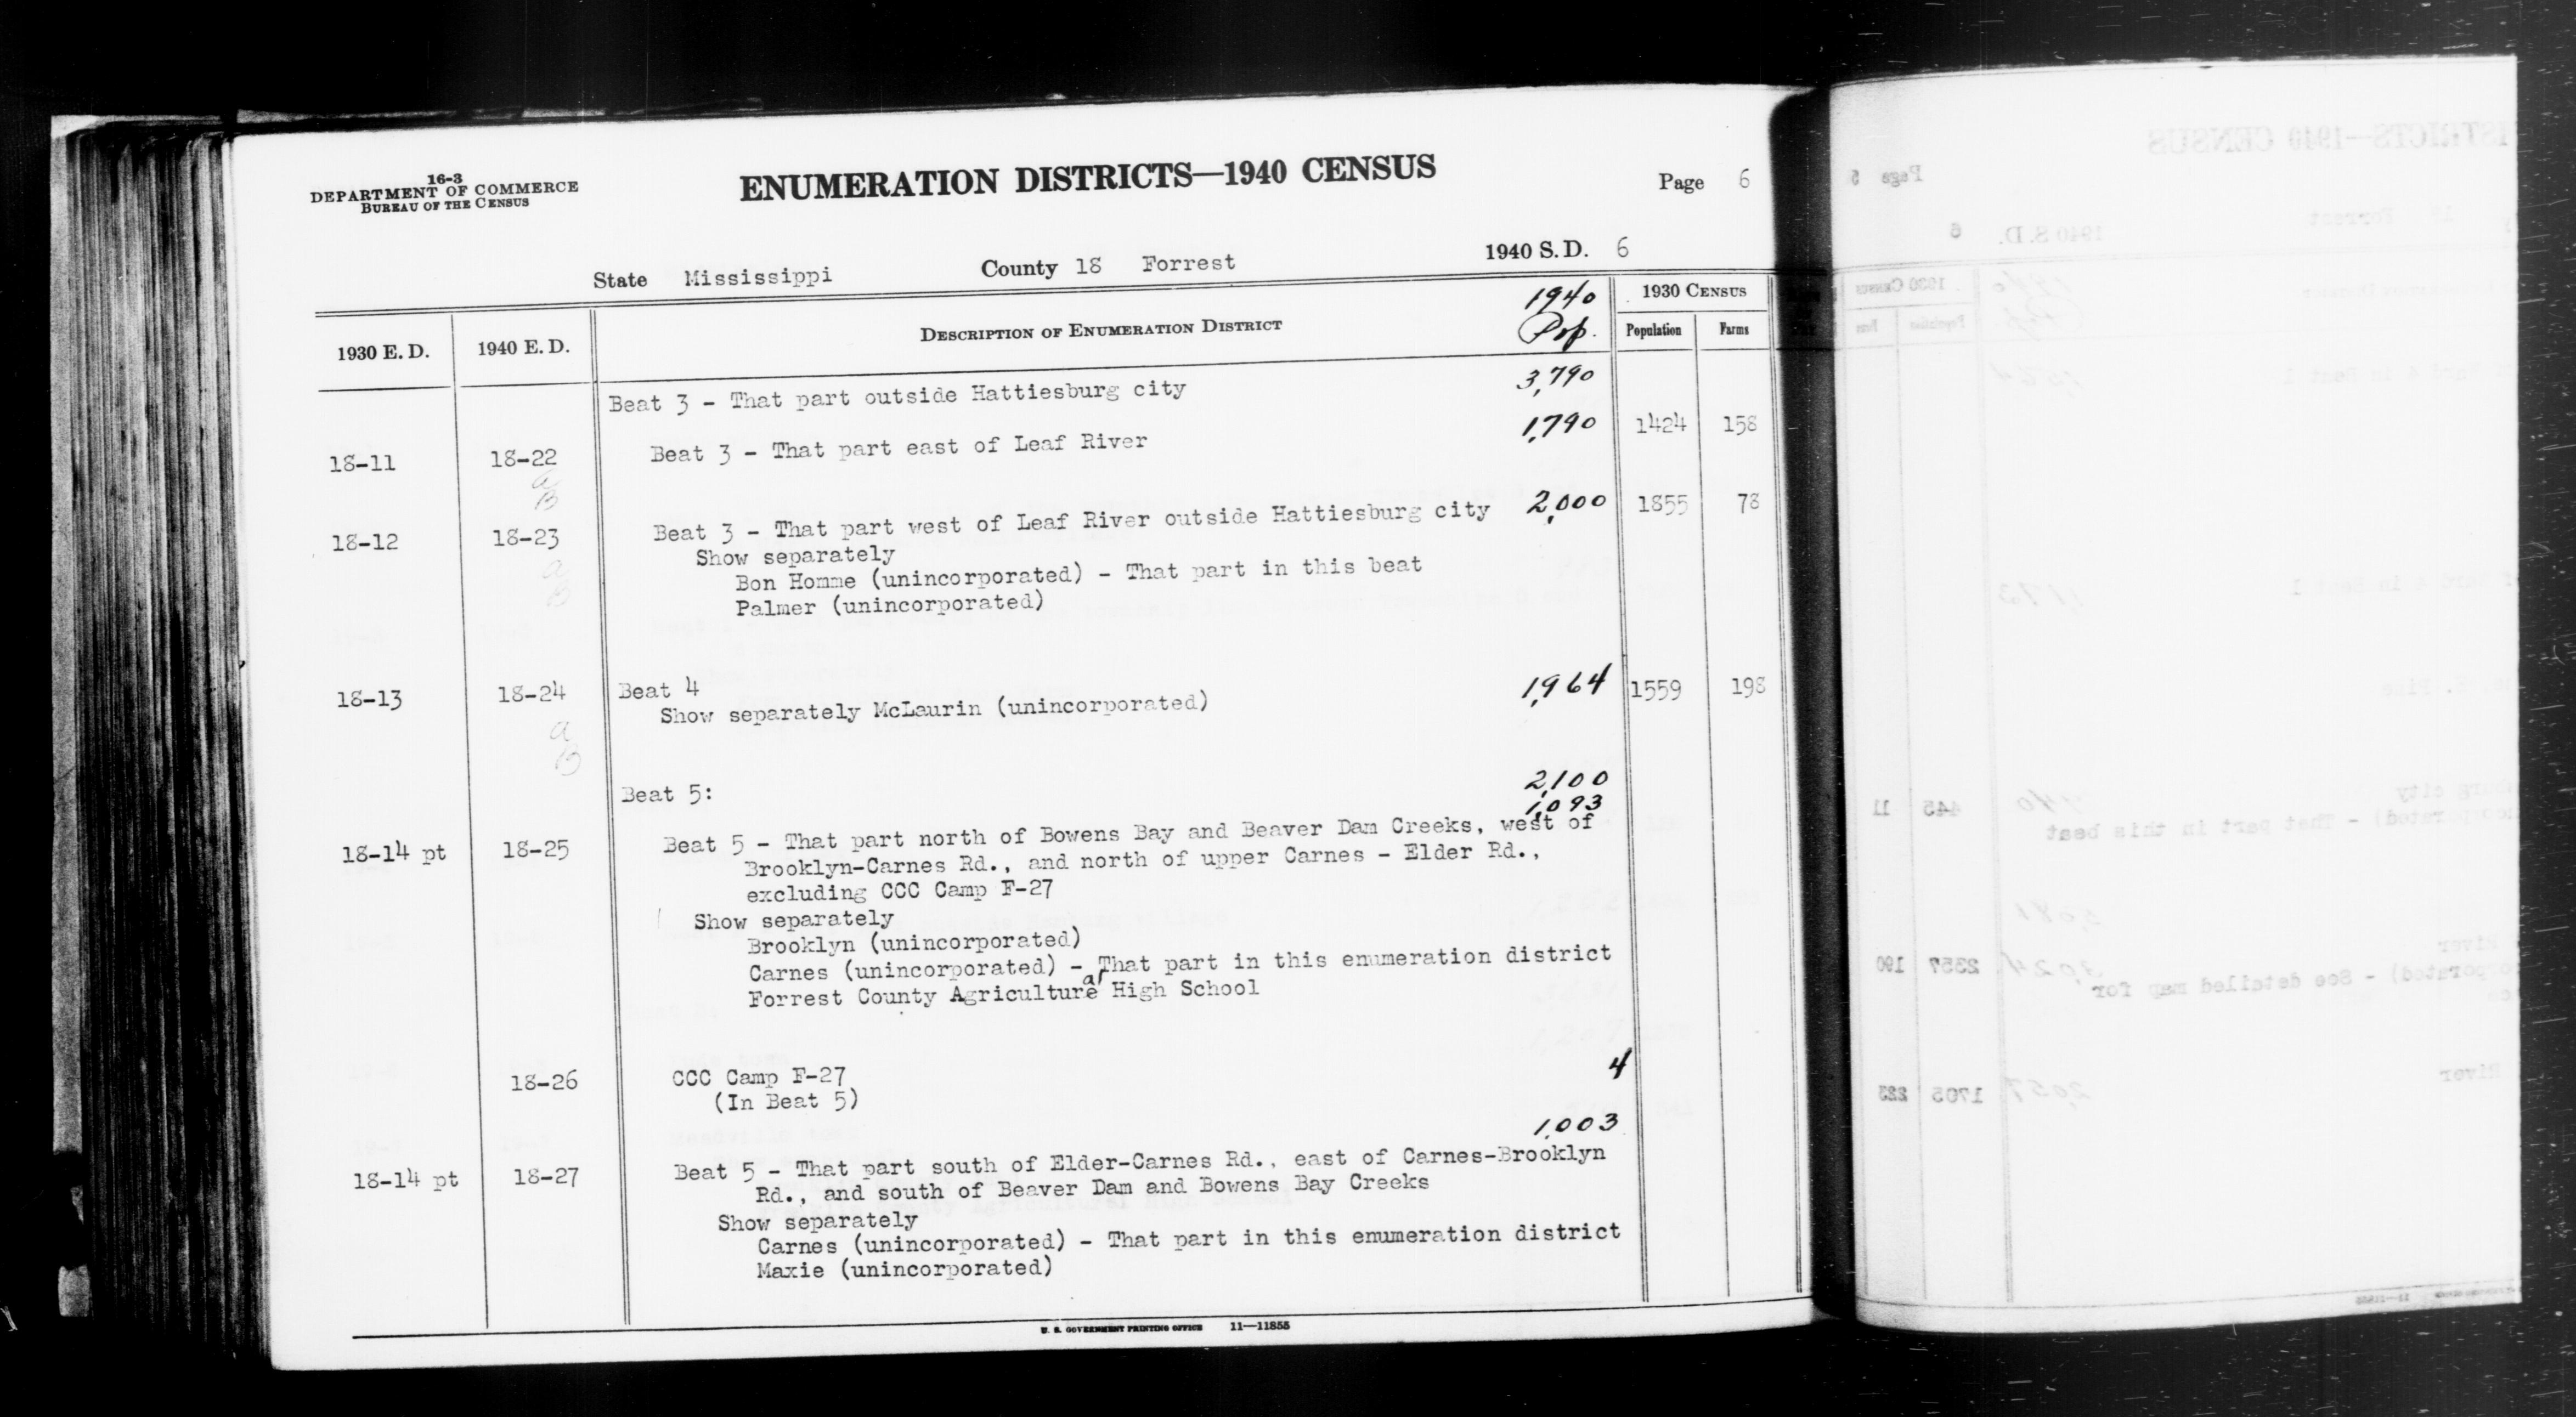 1940 Census Enumeration District Descriptions - Mississippi - Forrest County - ED 18-22A, ED 18-22B, ED 18-23A, ED 18-23B, ED 18-24A, ED 18-24B, ED 18-25, ED 18-26, ED 18-27